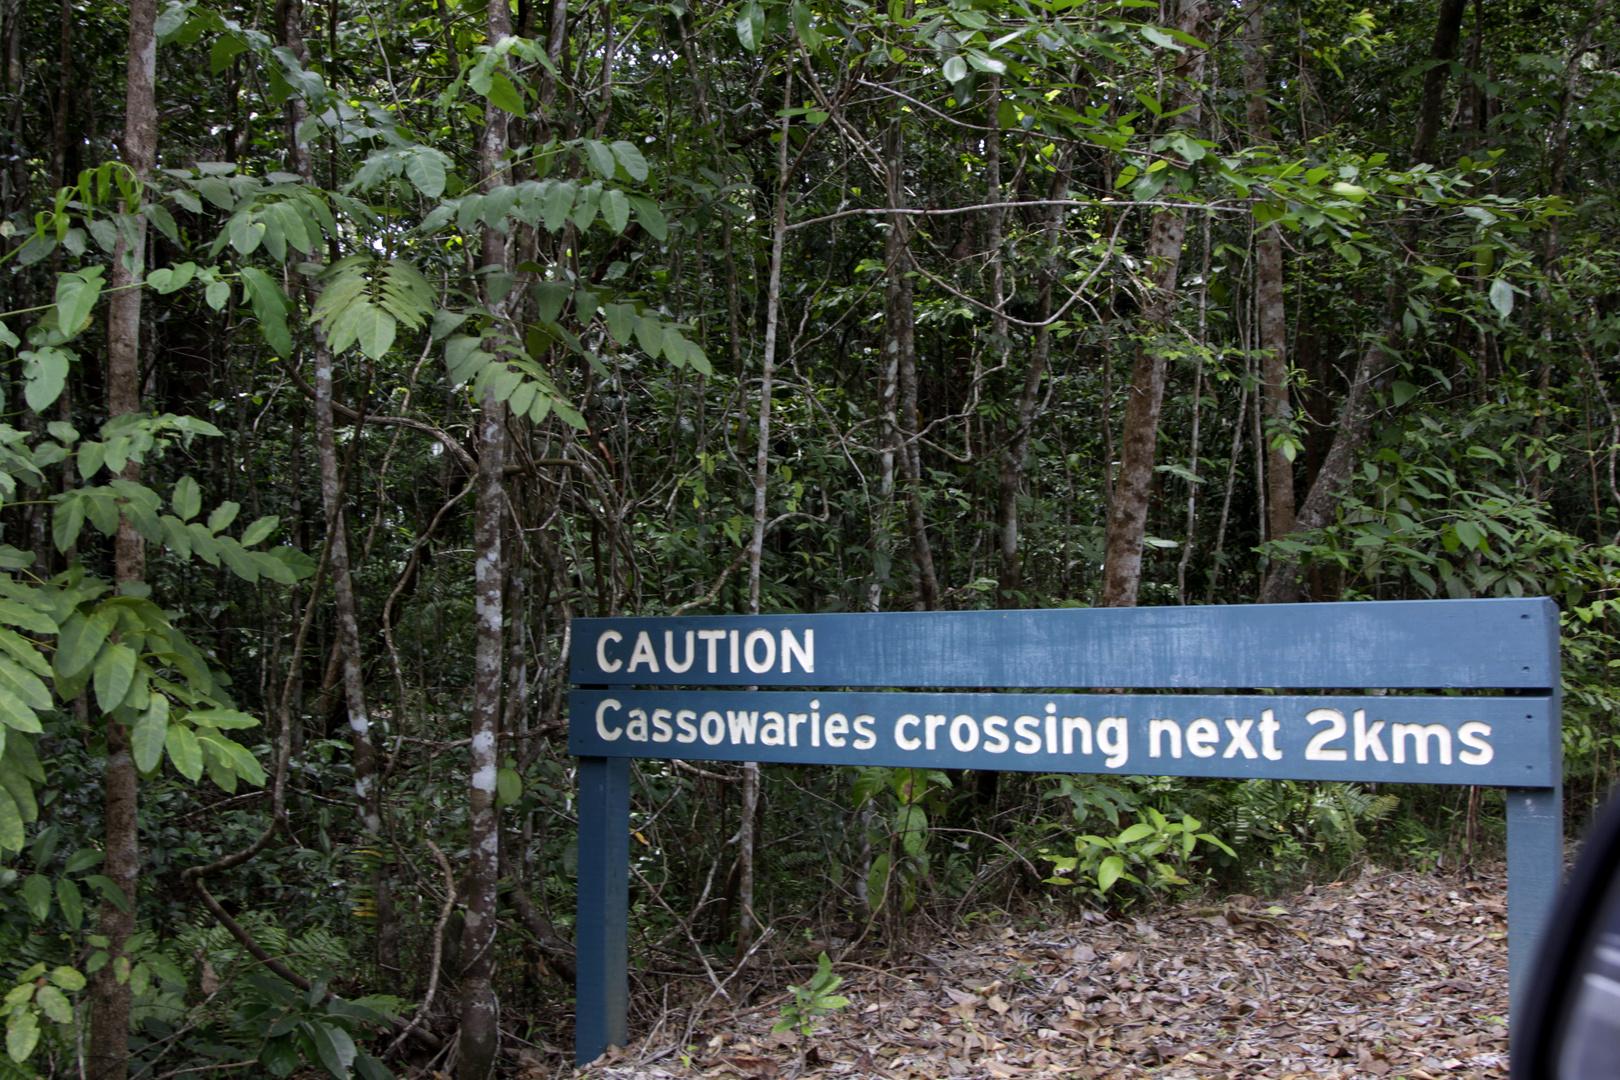 caution cassowaries crossing